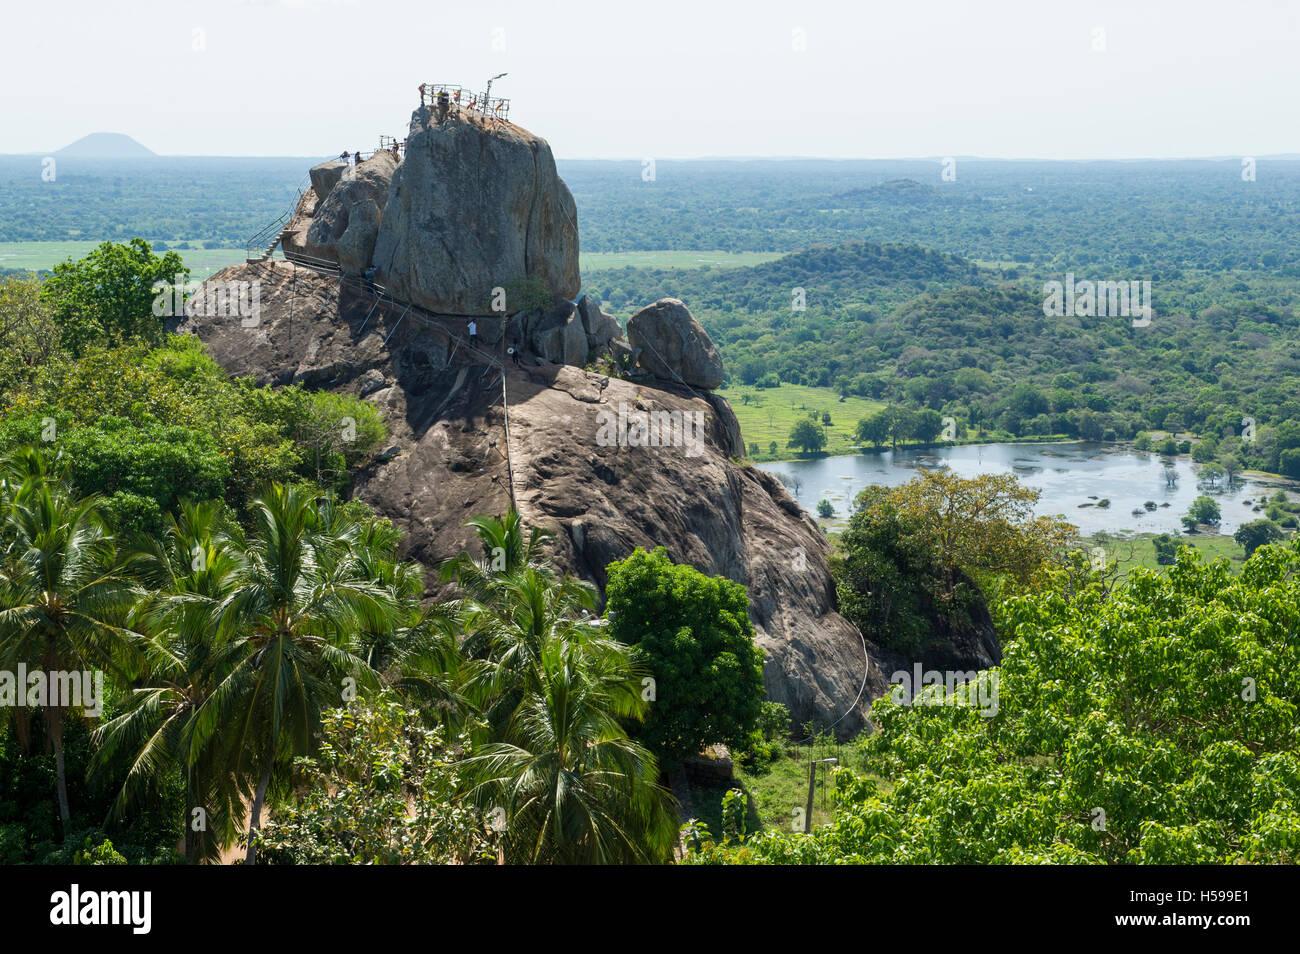 Aradhana Gala Rock, Mihintale, Anuradhapura, Sri Lanka Stock Photo